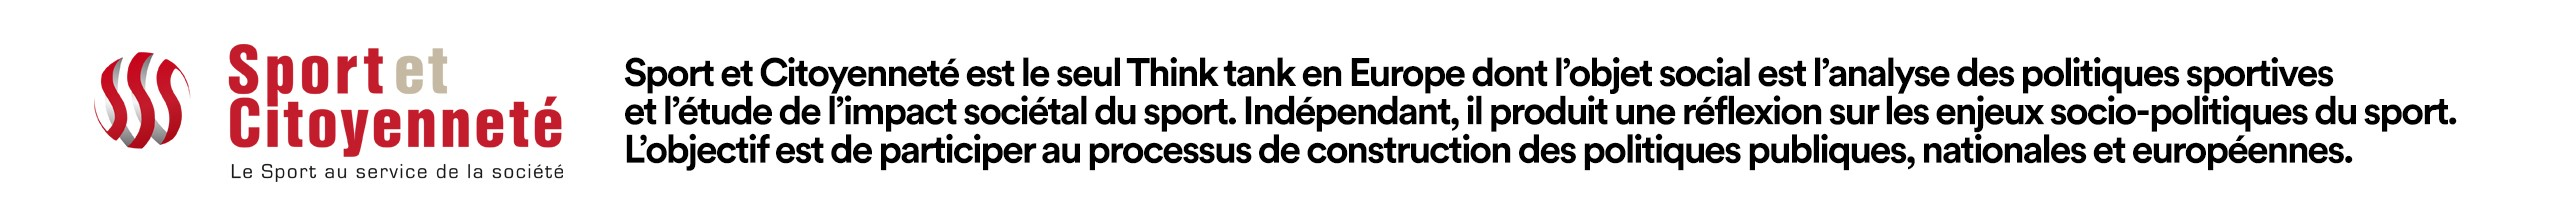 https://i.eurosport.com/2020/06/17/2834557.jpg